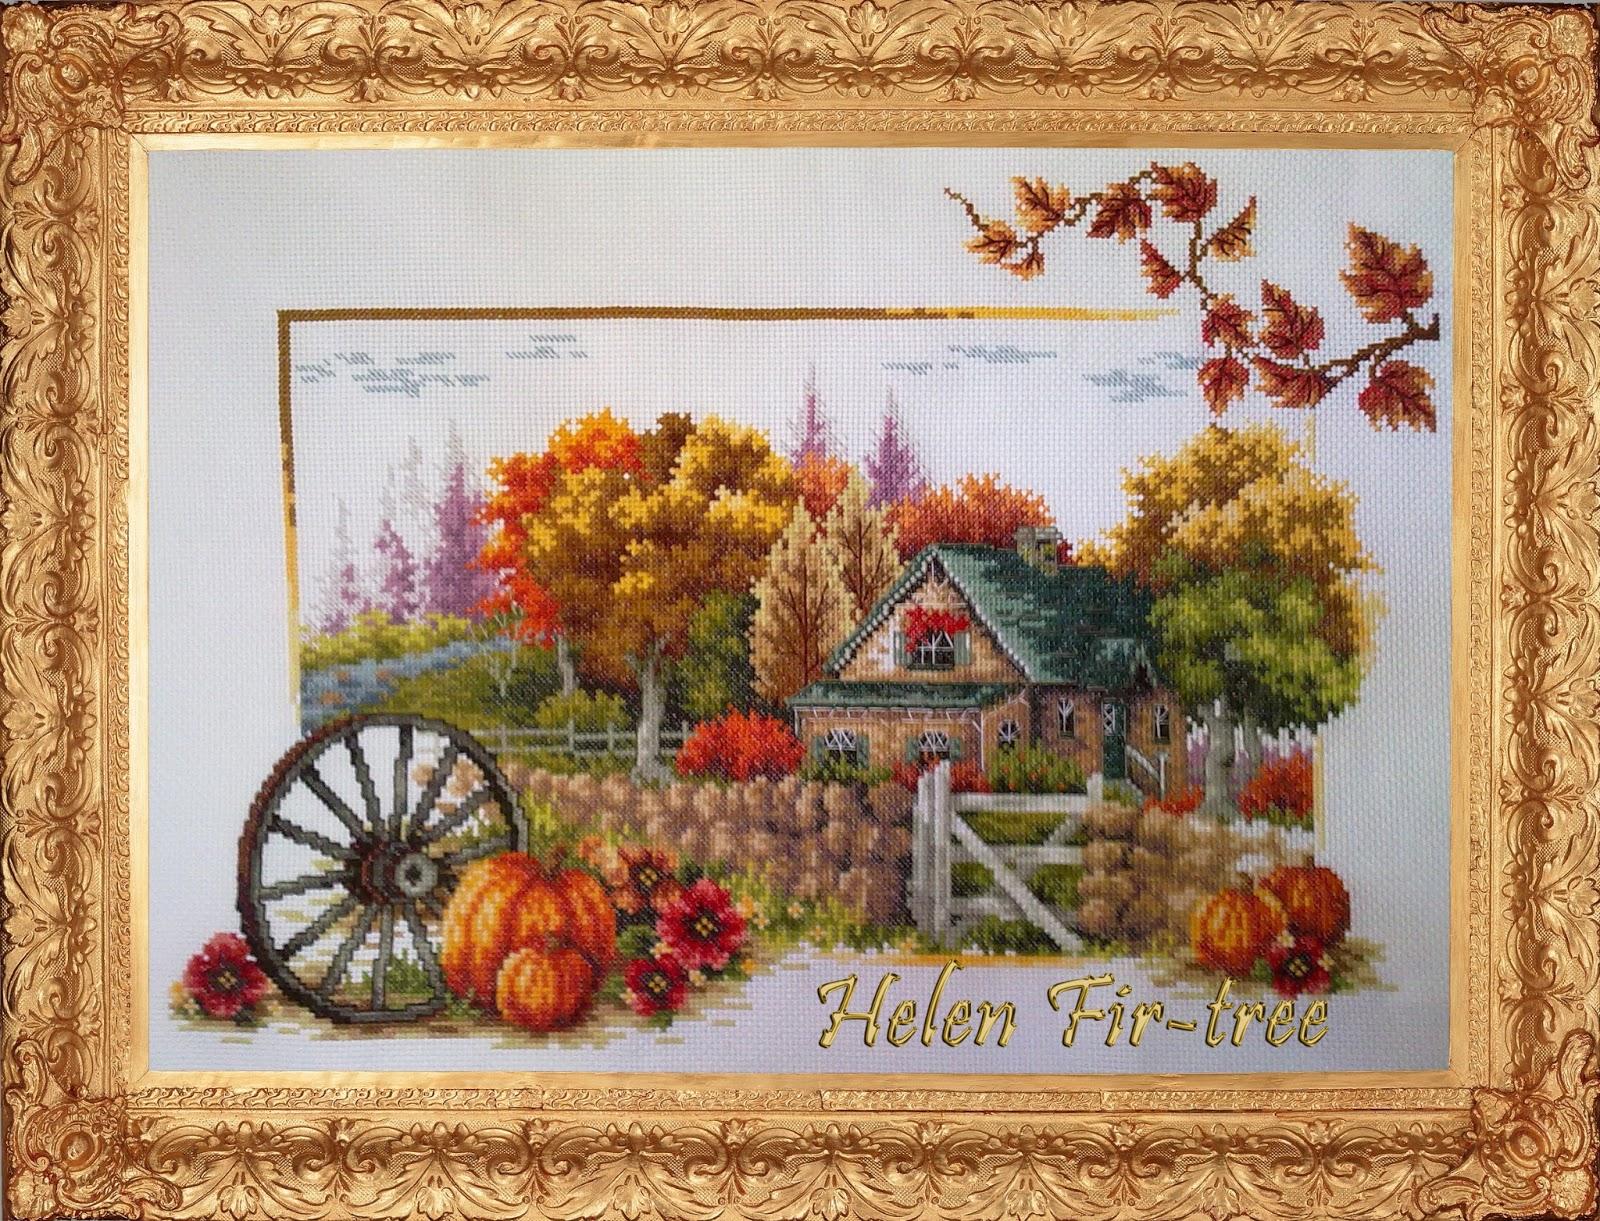 Hwlwn Fir-tree вышивка крестом  времена года Осень counted cross stitch seasons autumn